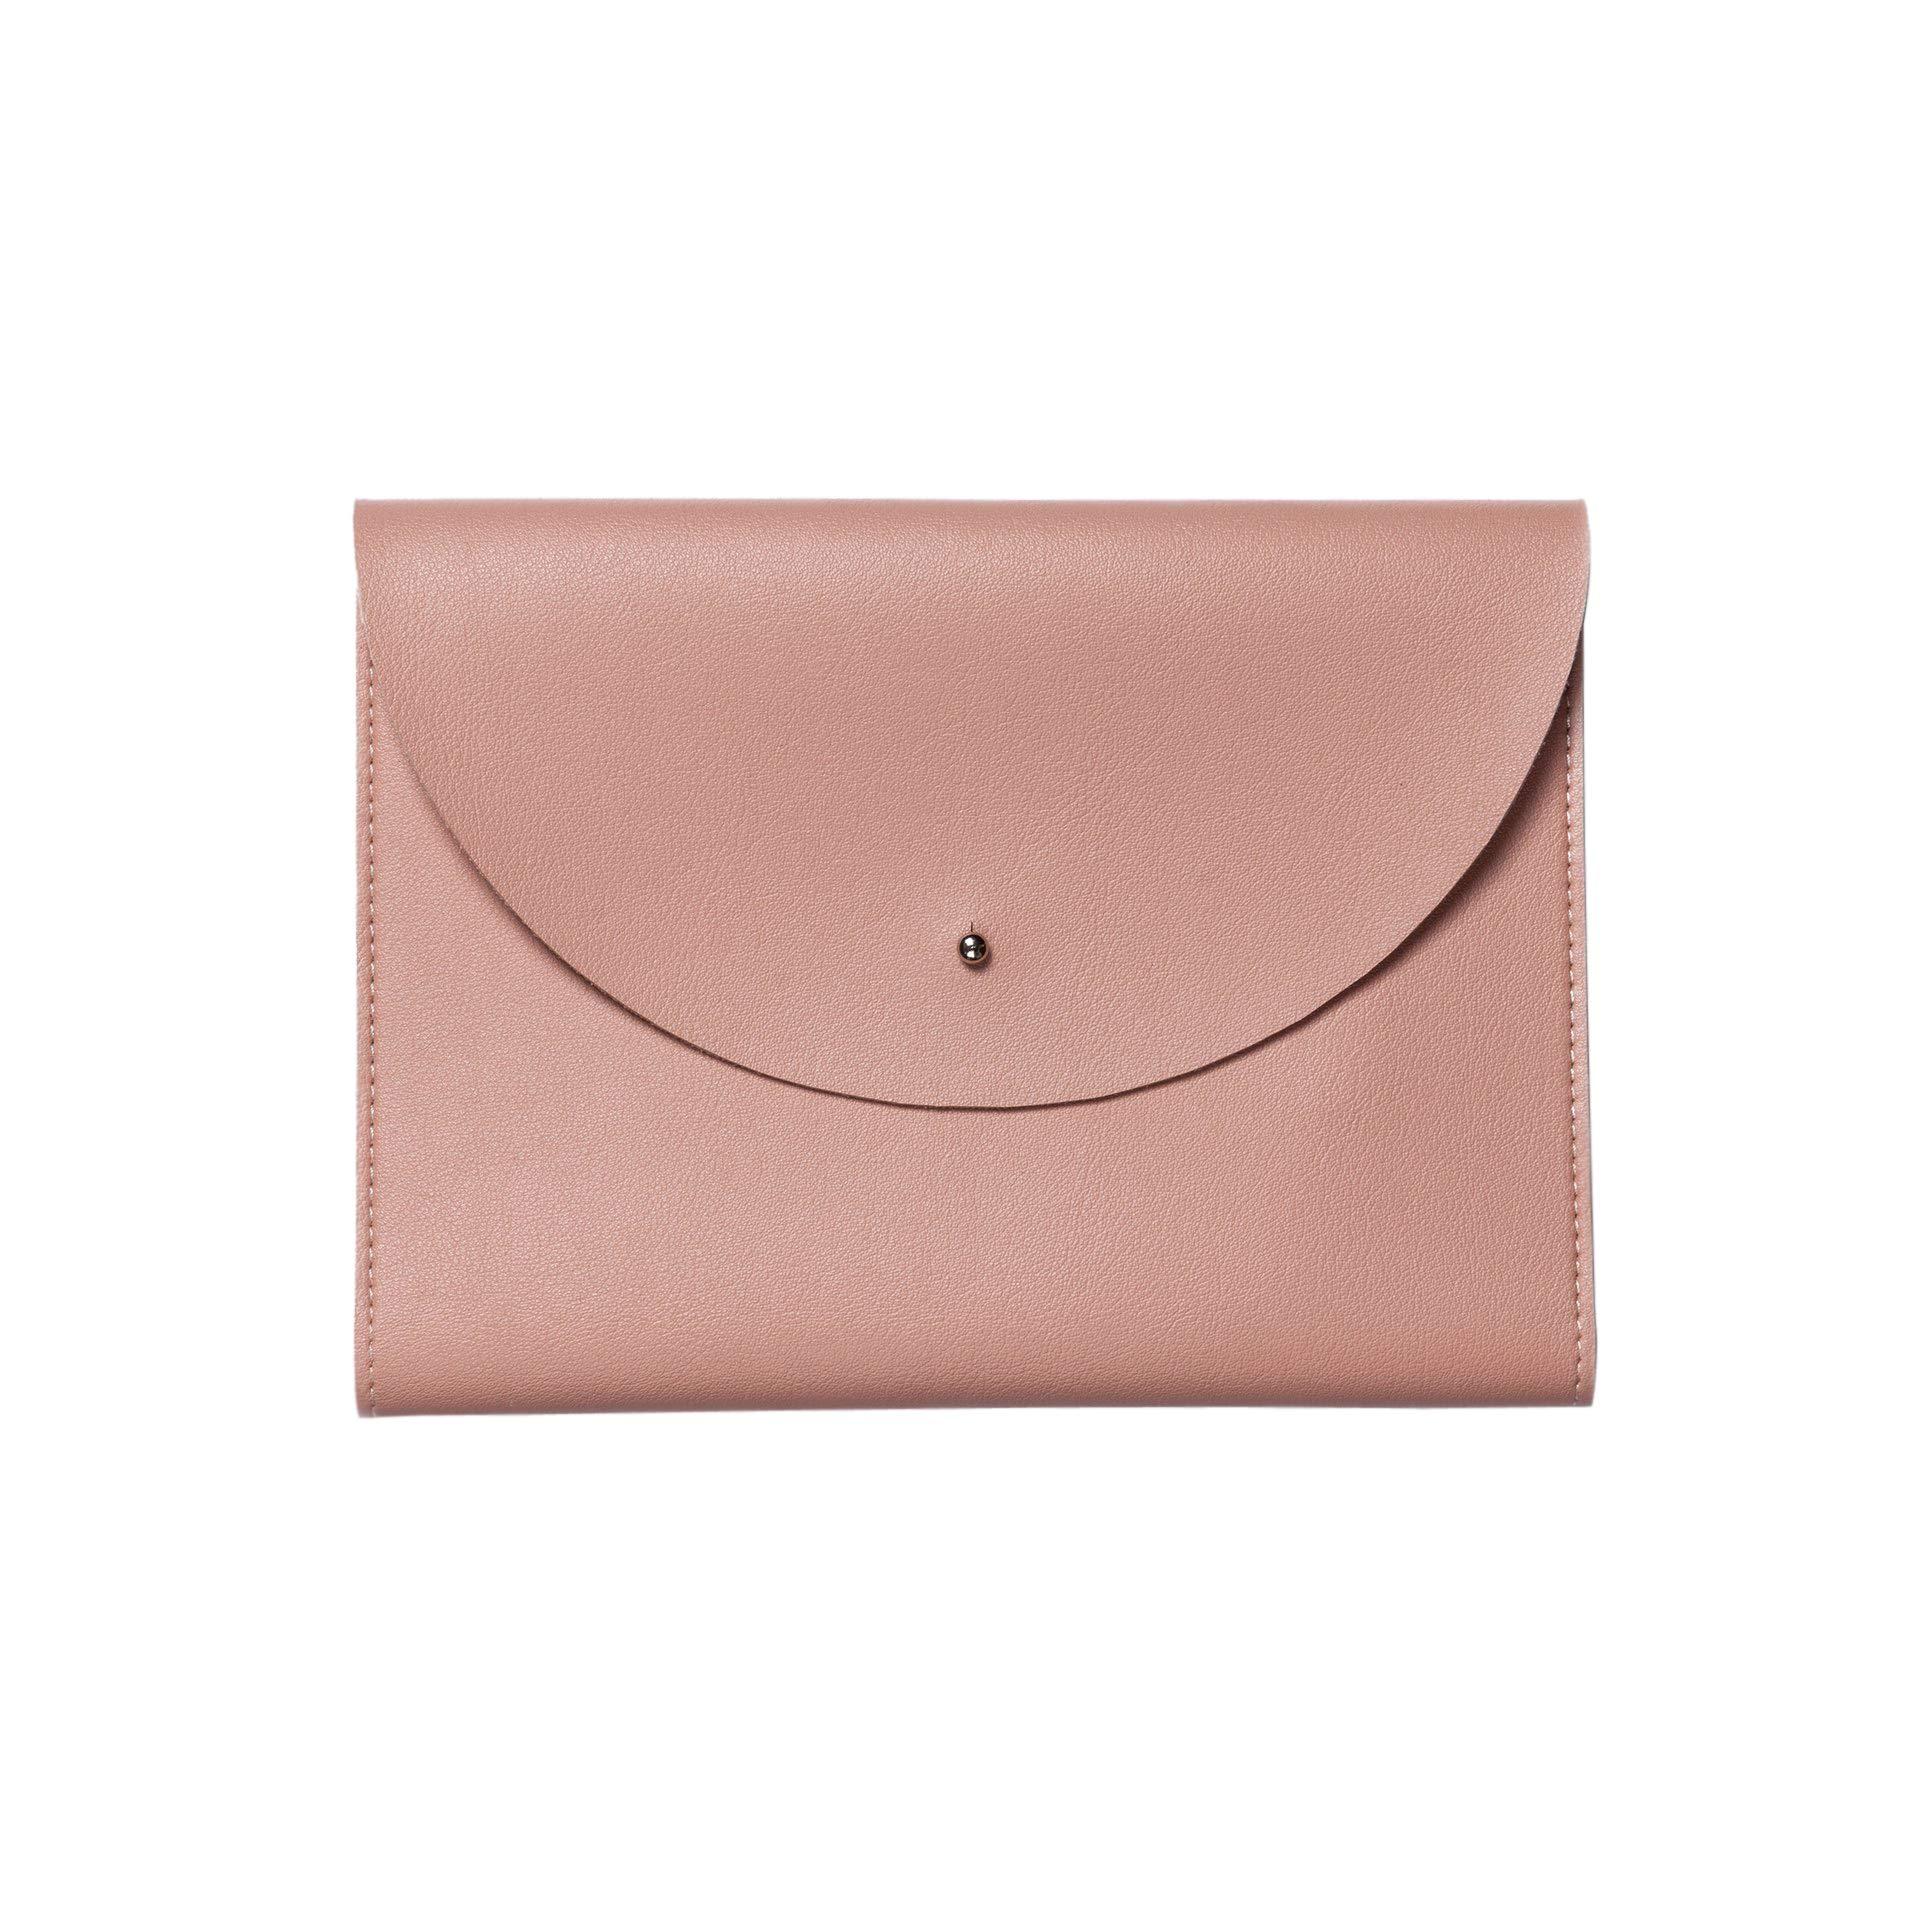 "Minimalist Folio Document Organizer & Notepad - Blush Pink - 9.25 x 7"" (Medium)"